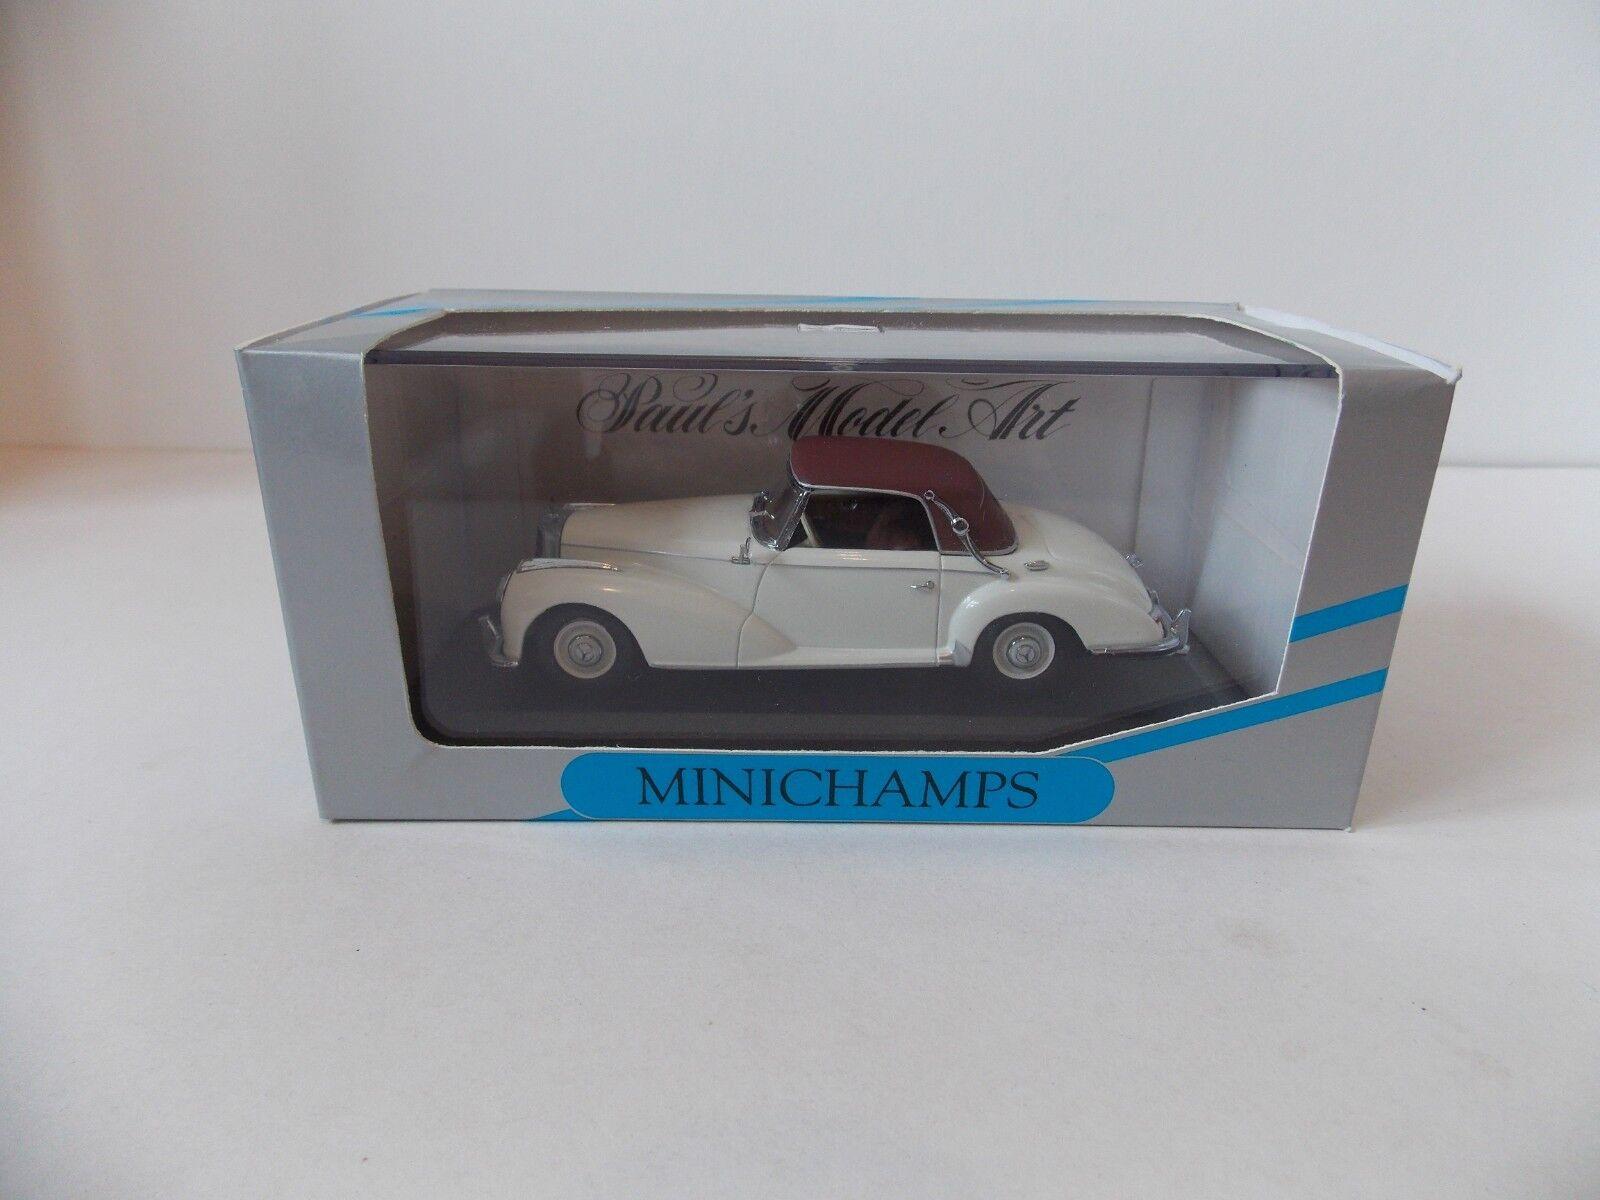 Minichamps Mercedes-Benz 300 S Cabrolet Sof Top,White 1951-1955 Min 032341